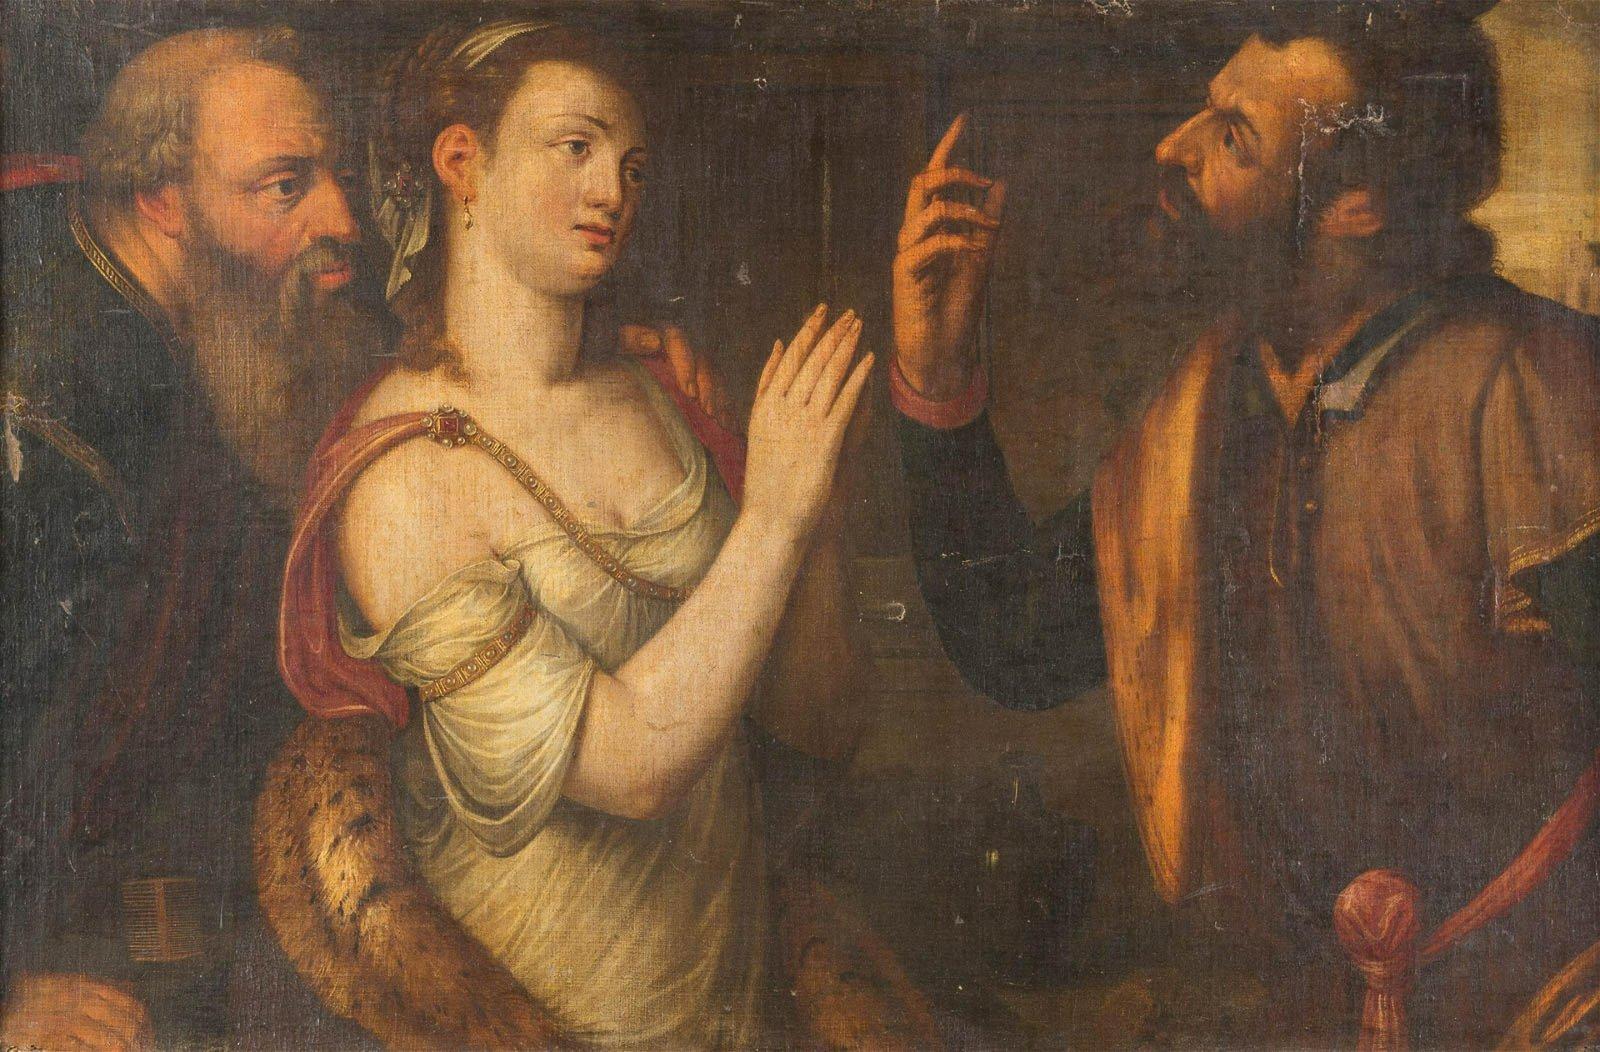 ITALIAN/FLEMISH SCHOOL Master active 16th century